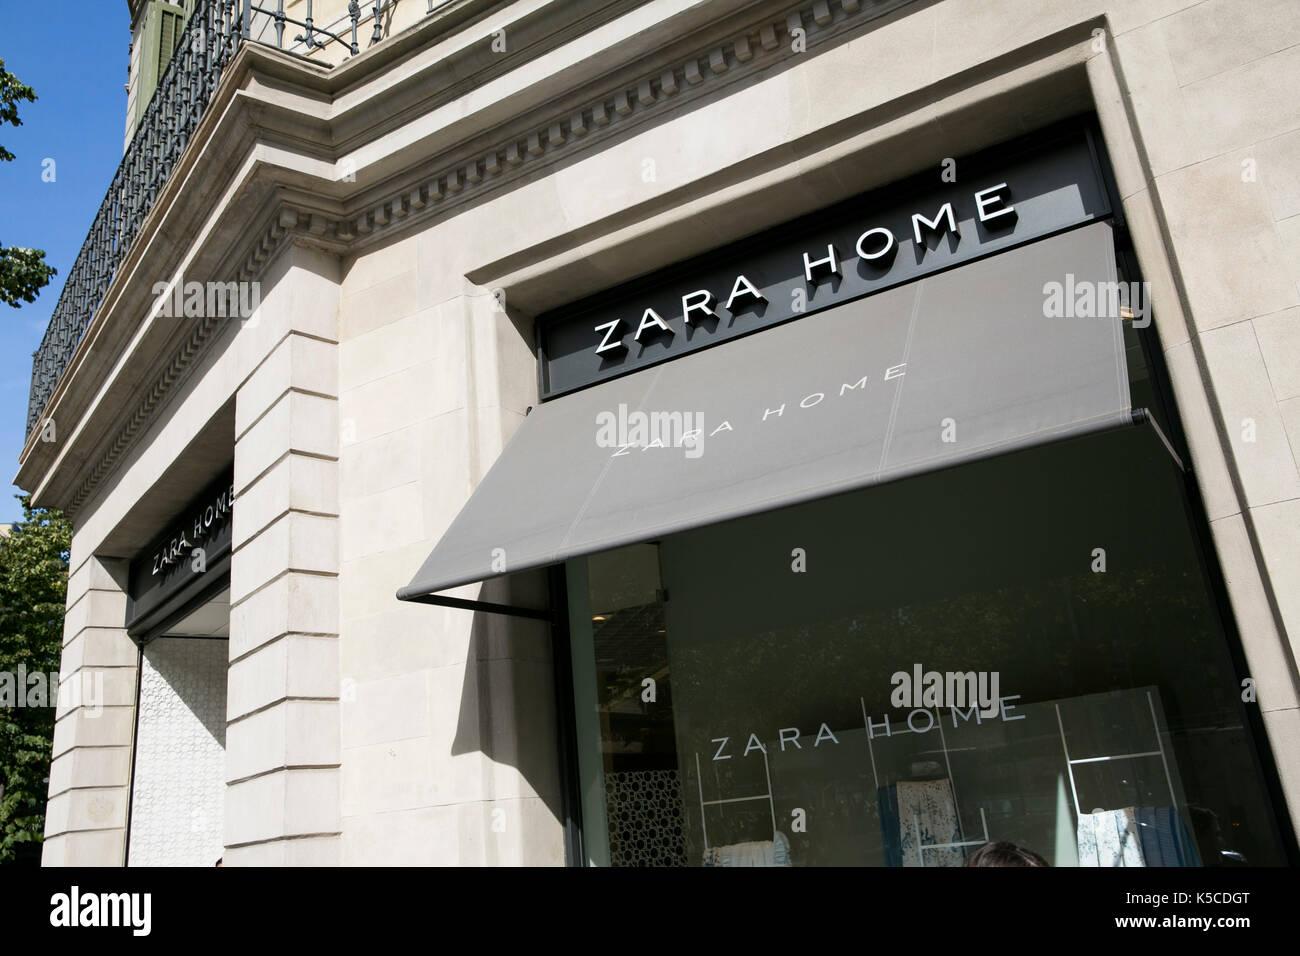 zara home stock photos zara home stock images alamy. Black Bedroom Furniture Sets. Home Design Ideas